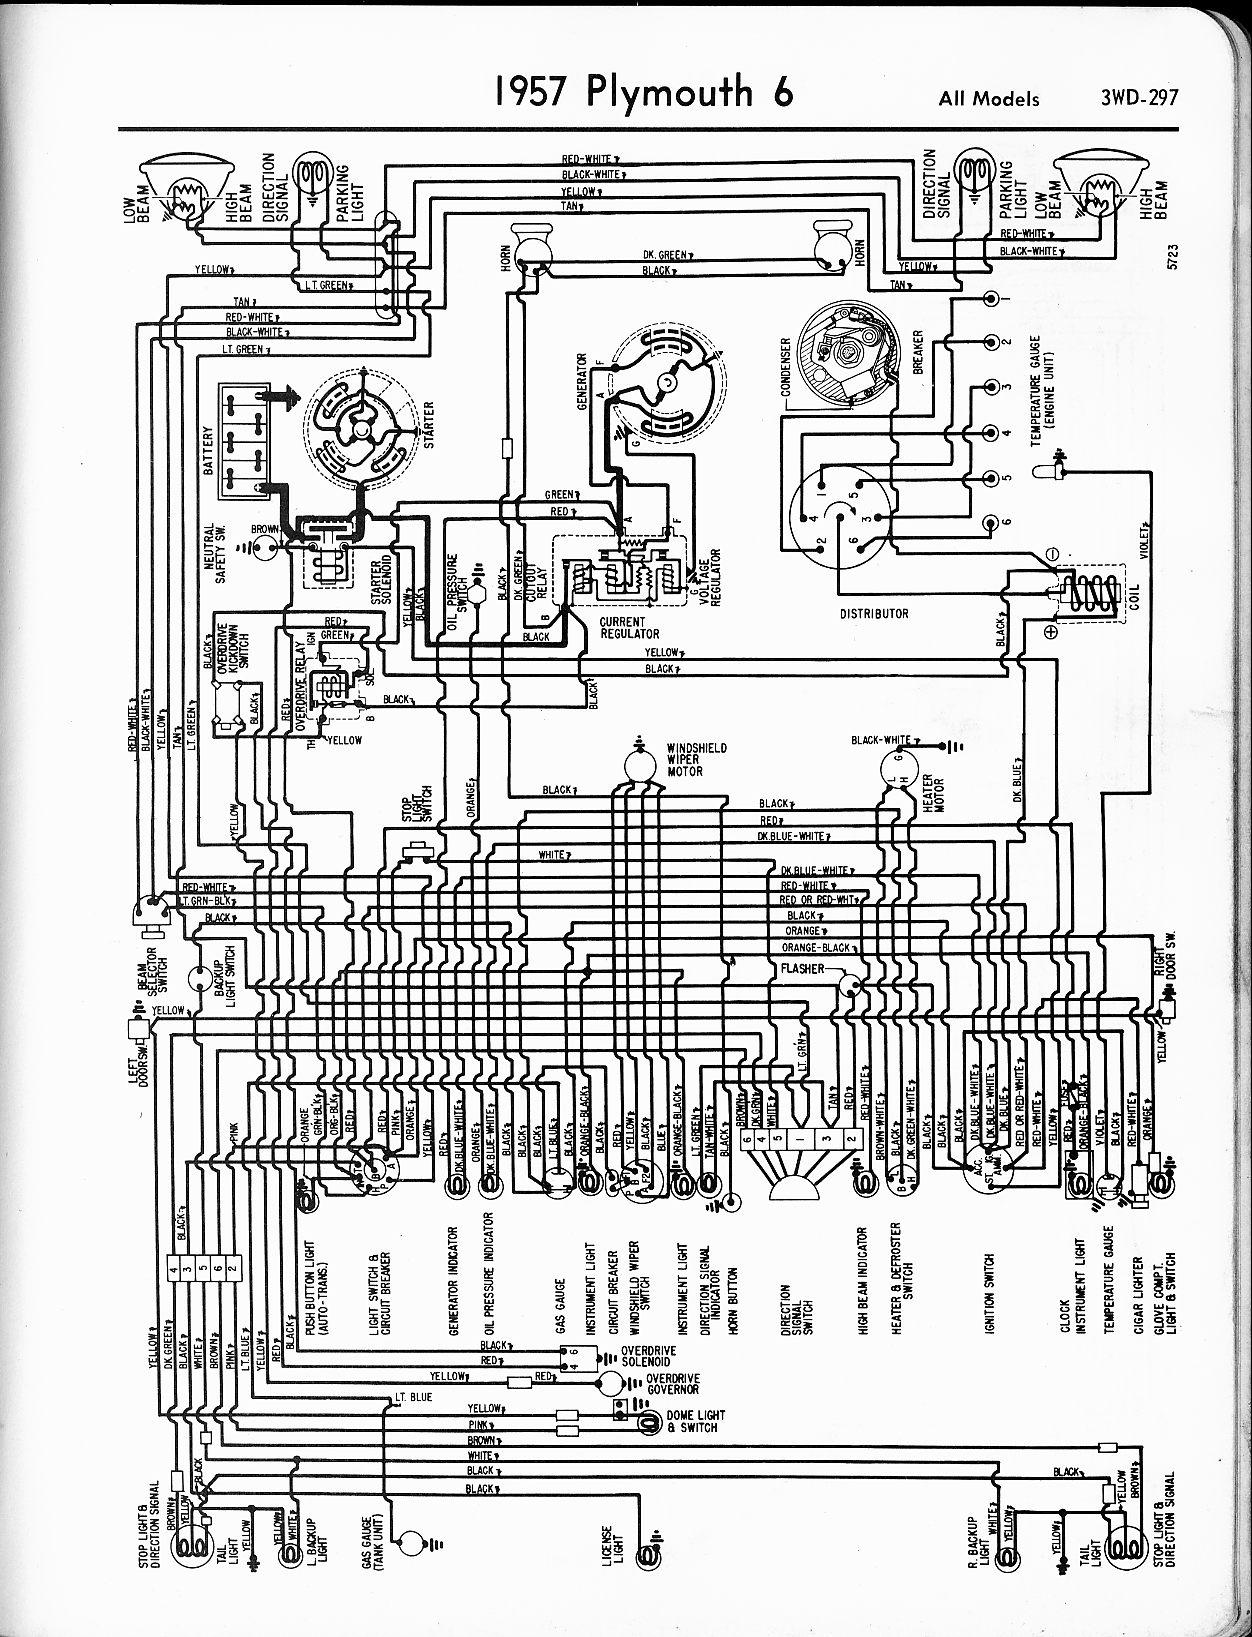 1965 Plymouth Sport Fury Wiring Diagram - Clarion Double Din Wiring Diagram  - source-auto4.yenpancane.jeanjaures37.fr | 1965 Plymouth Wiring Diagram |  | Wiring Diagram Resource